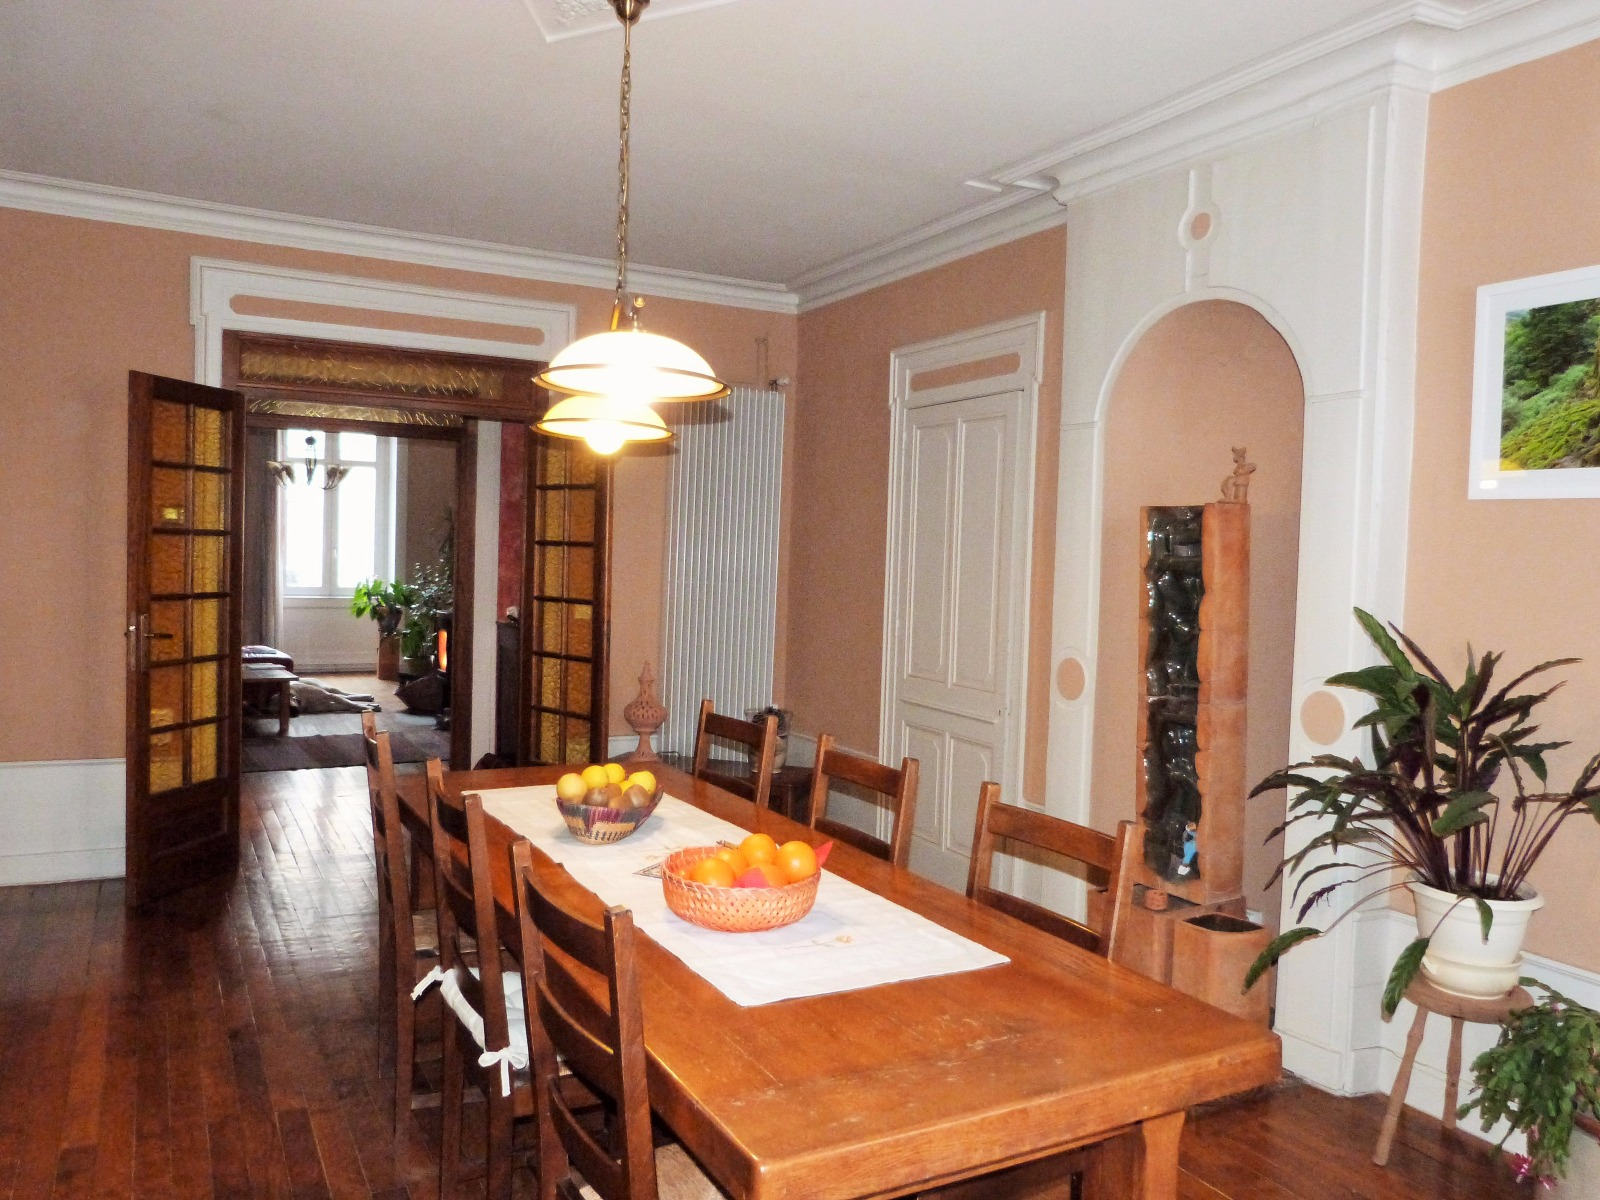 lons le saunier 39000 jura plein centre appartement 139m env 1er tage 3 chambres 3d immobilier. Black Bedroom Furniture Sets. Home Design Ideas